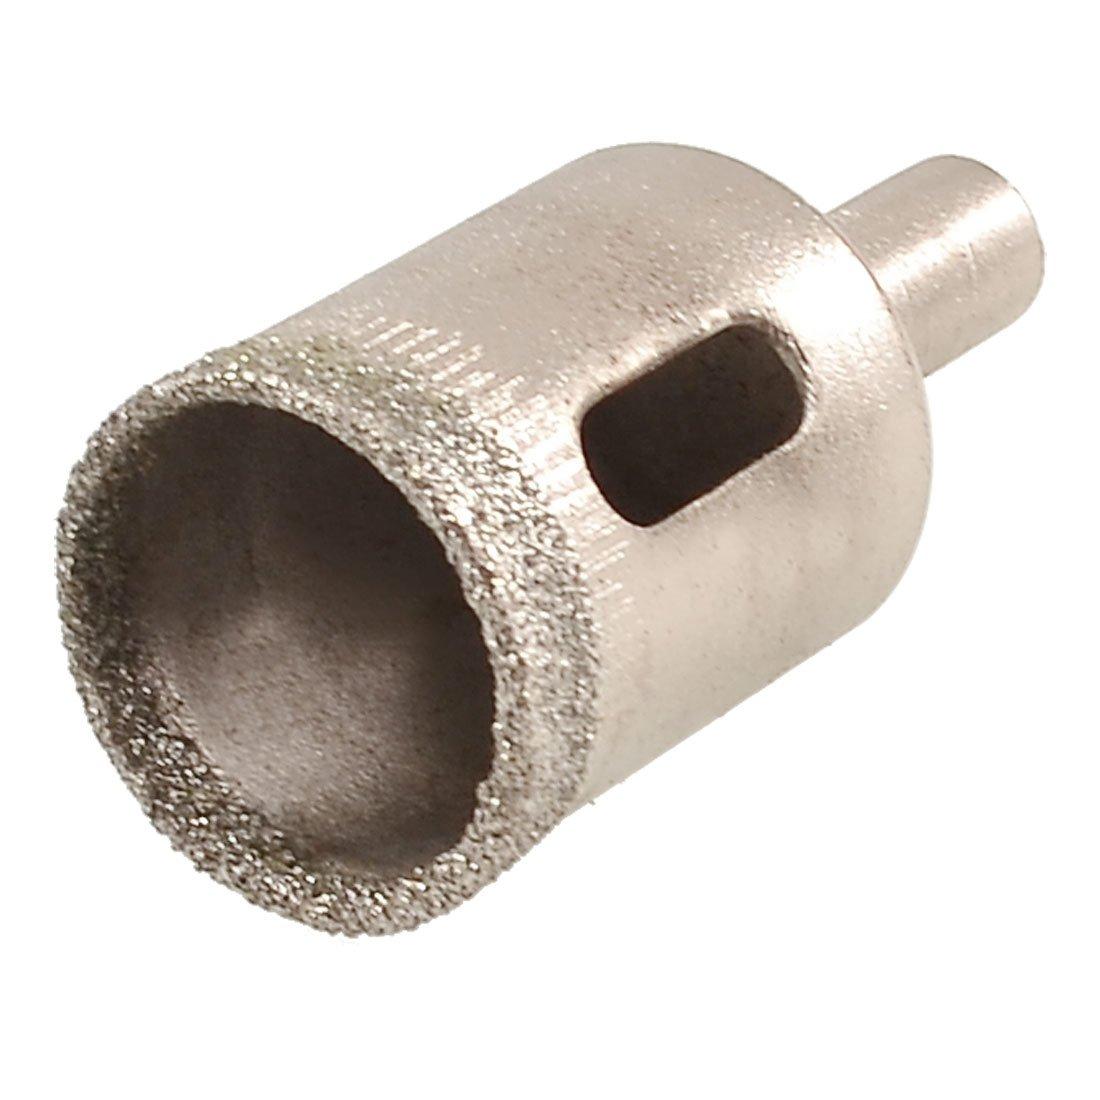 4mm diamond twist drill bit - Fslh 20mm Diamond Tipped Drill Bit Ceramic Tile Glass Hole Saw China Mainland